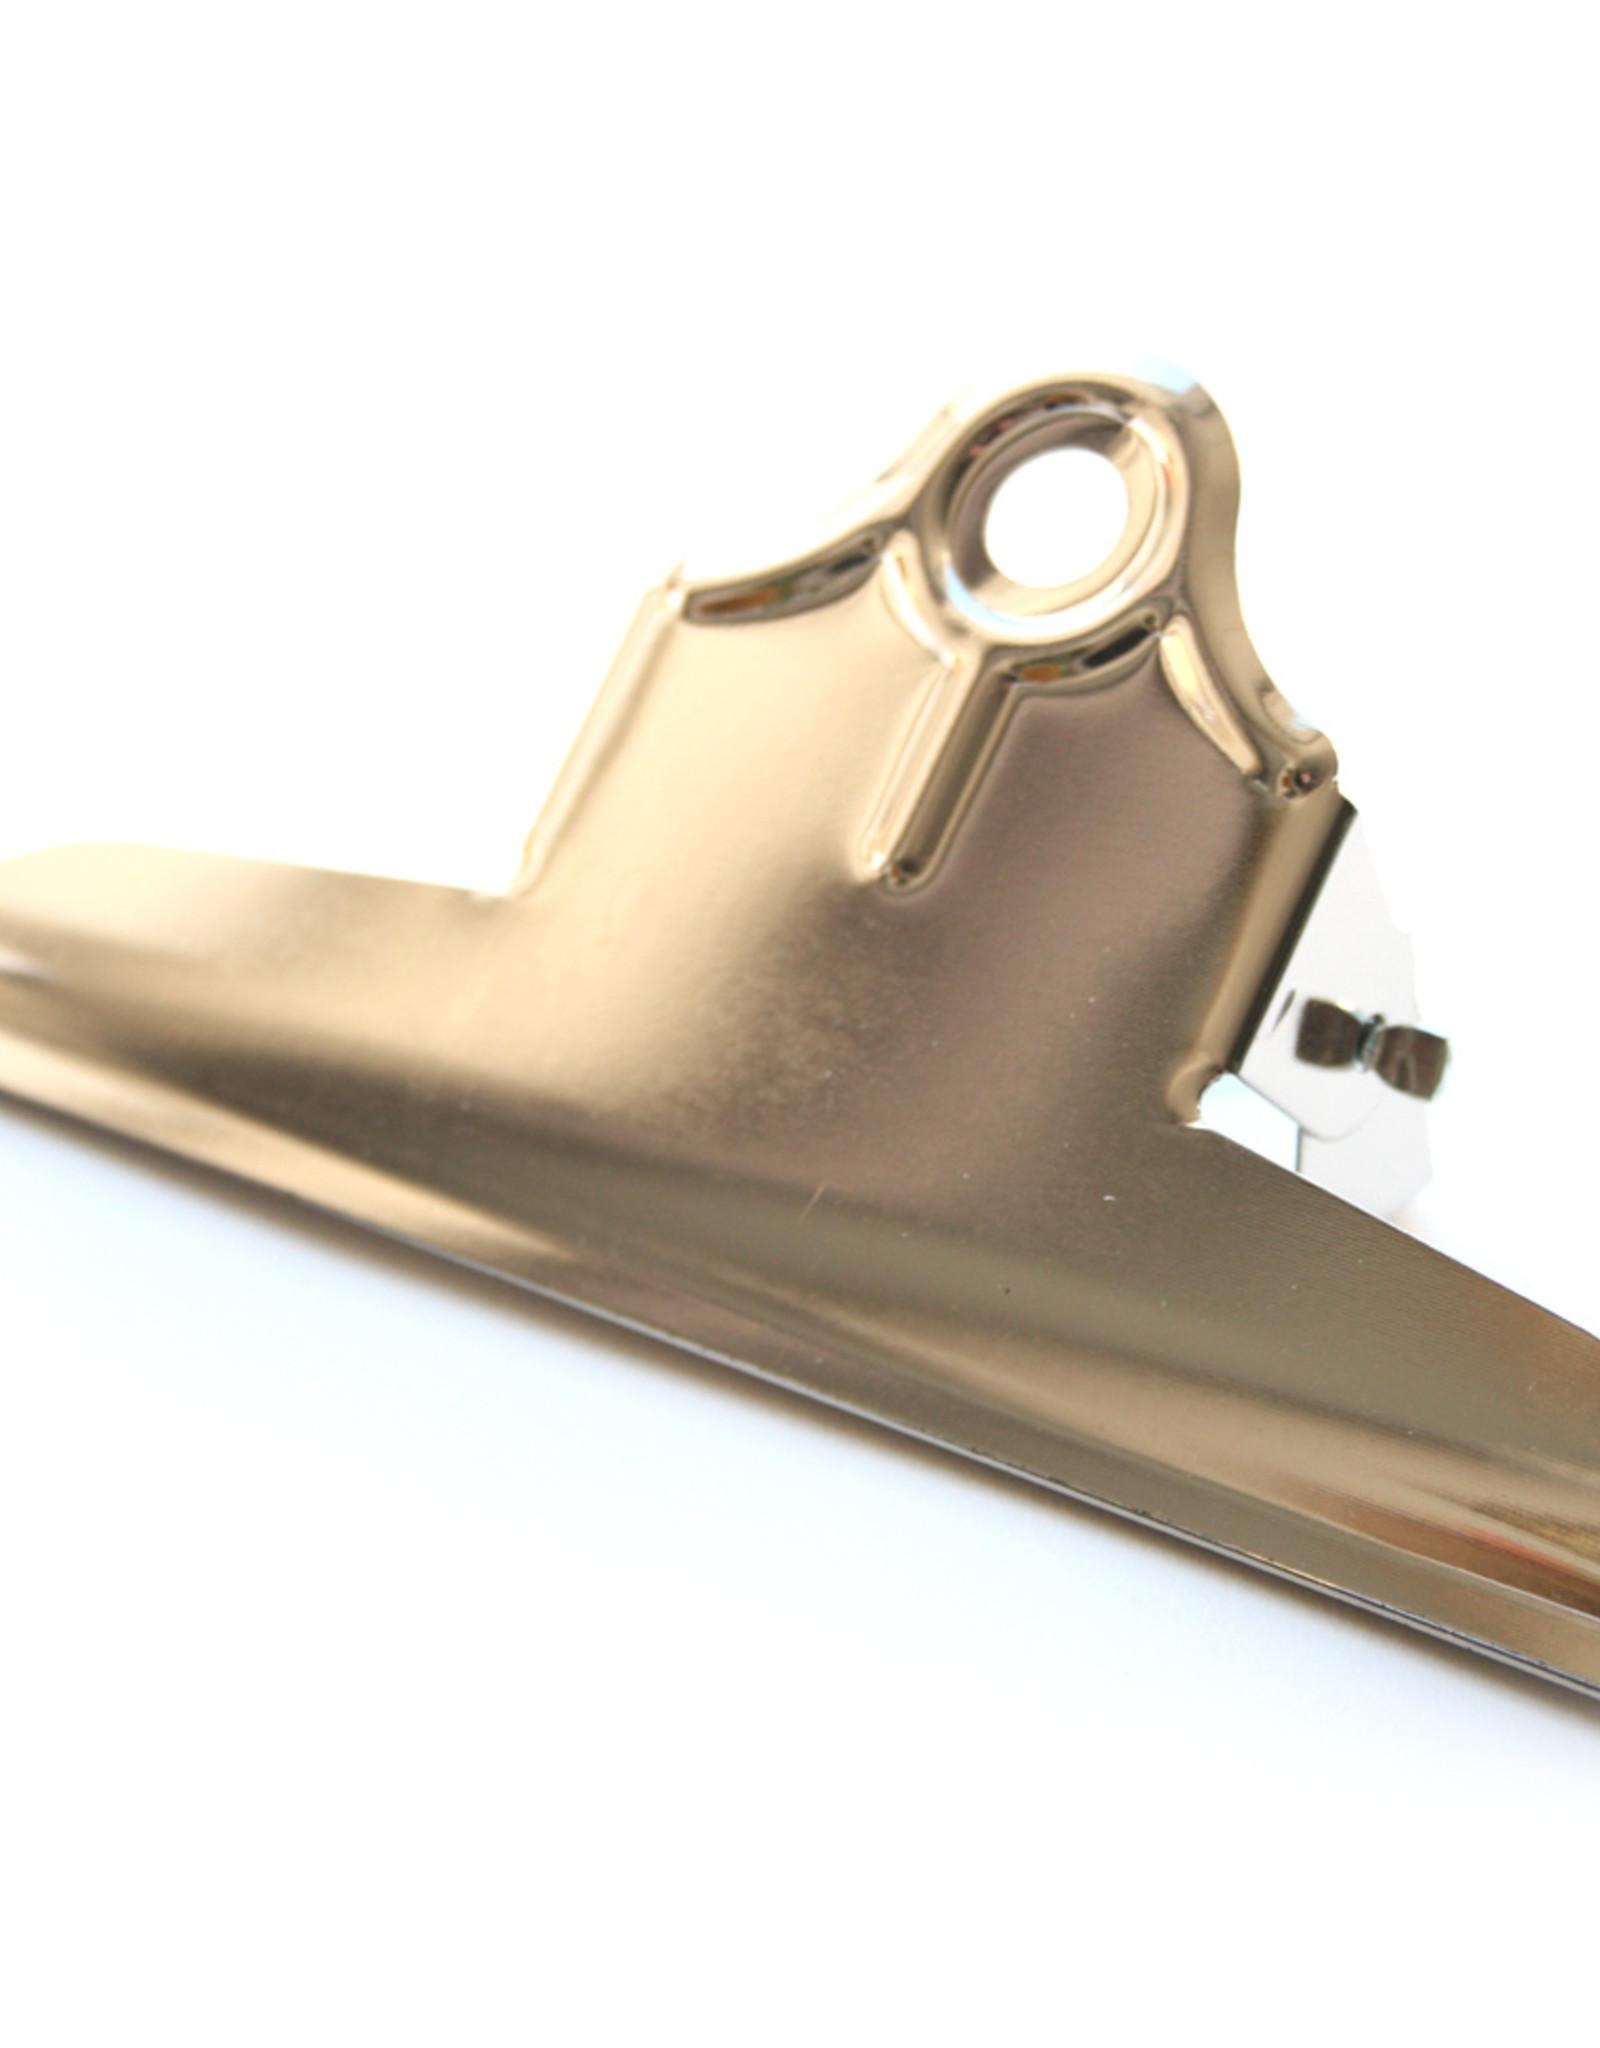 Alco 10 stuks Papierklem 75mm Alco Vernikkeld